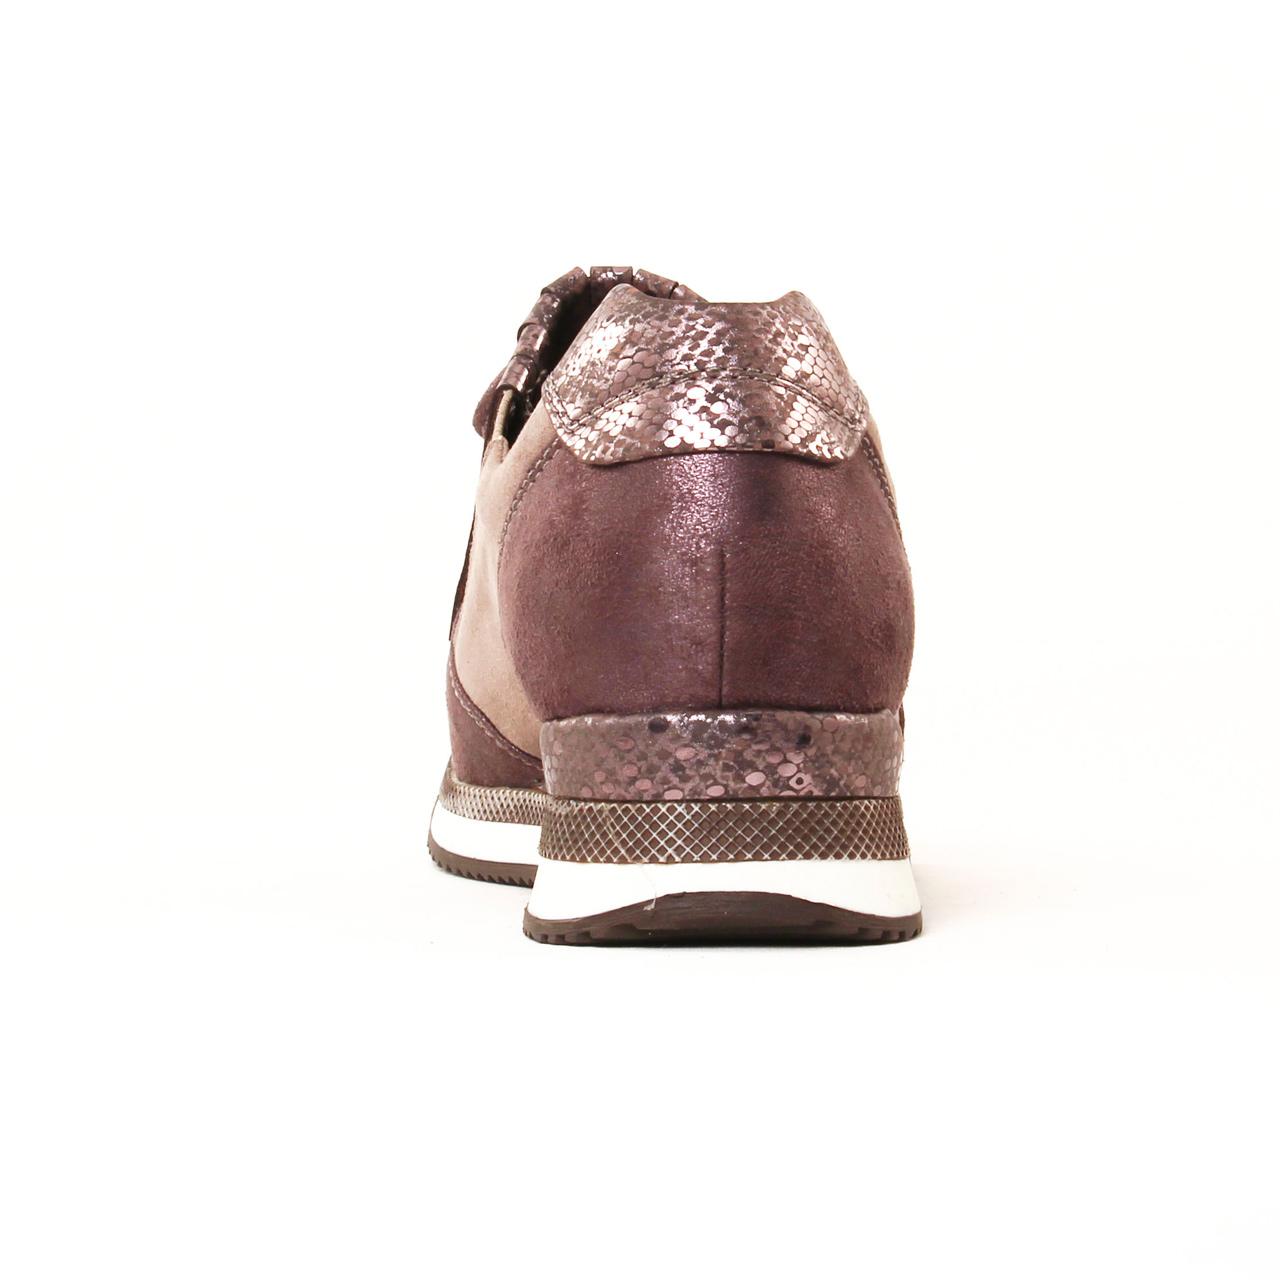 chaussures mode automne 2017 femme. Black Bedroom Furniture Sets. Home Design Ideas